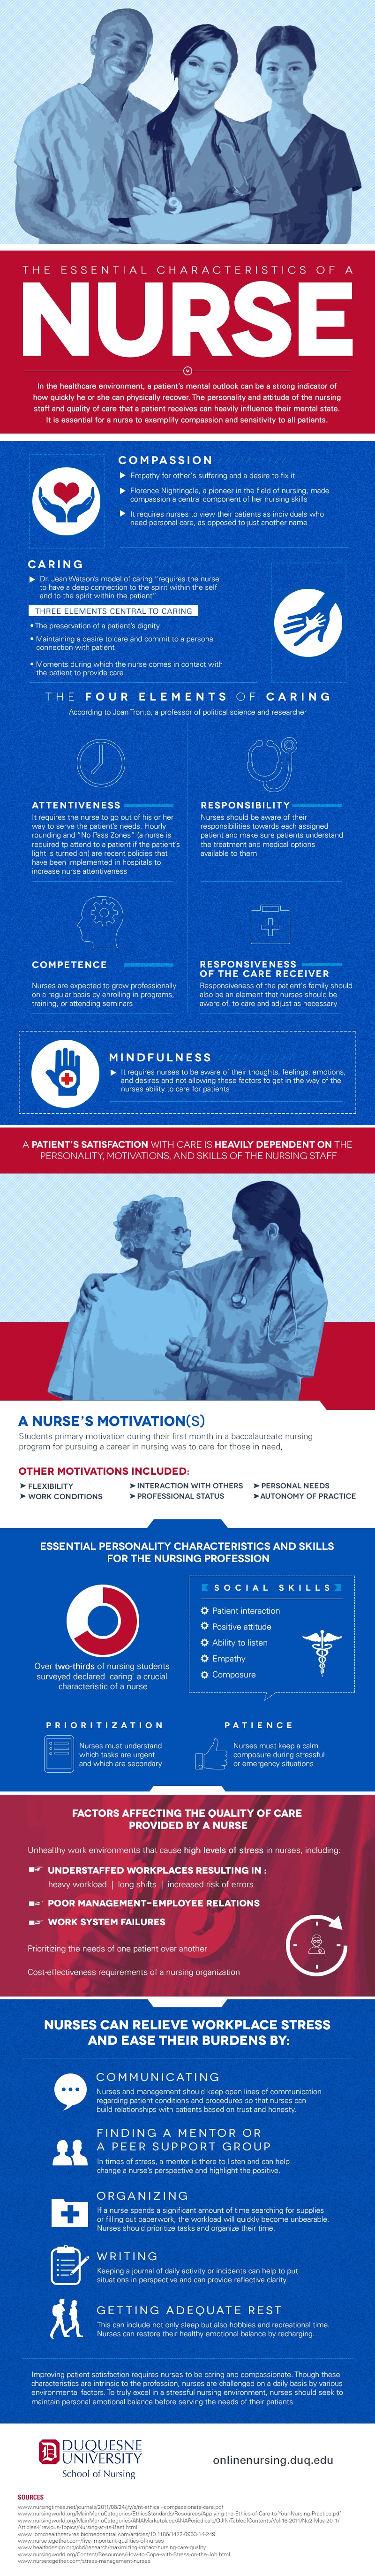 characteristics of nursing infographic